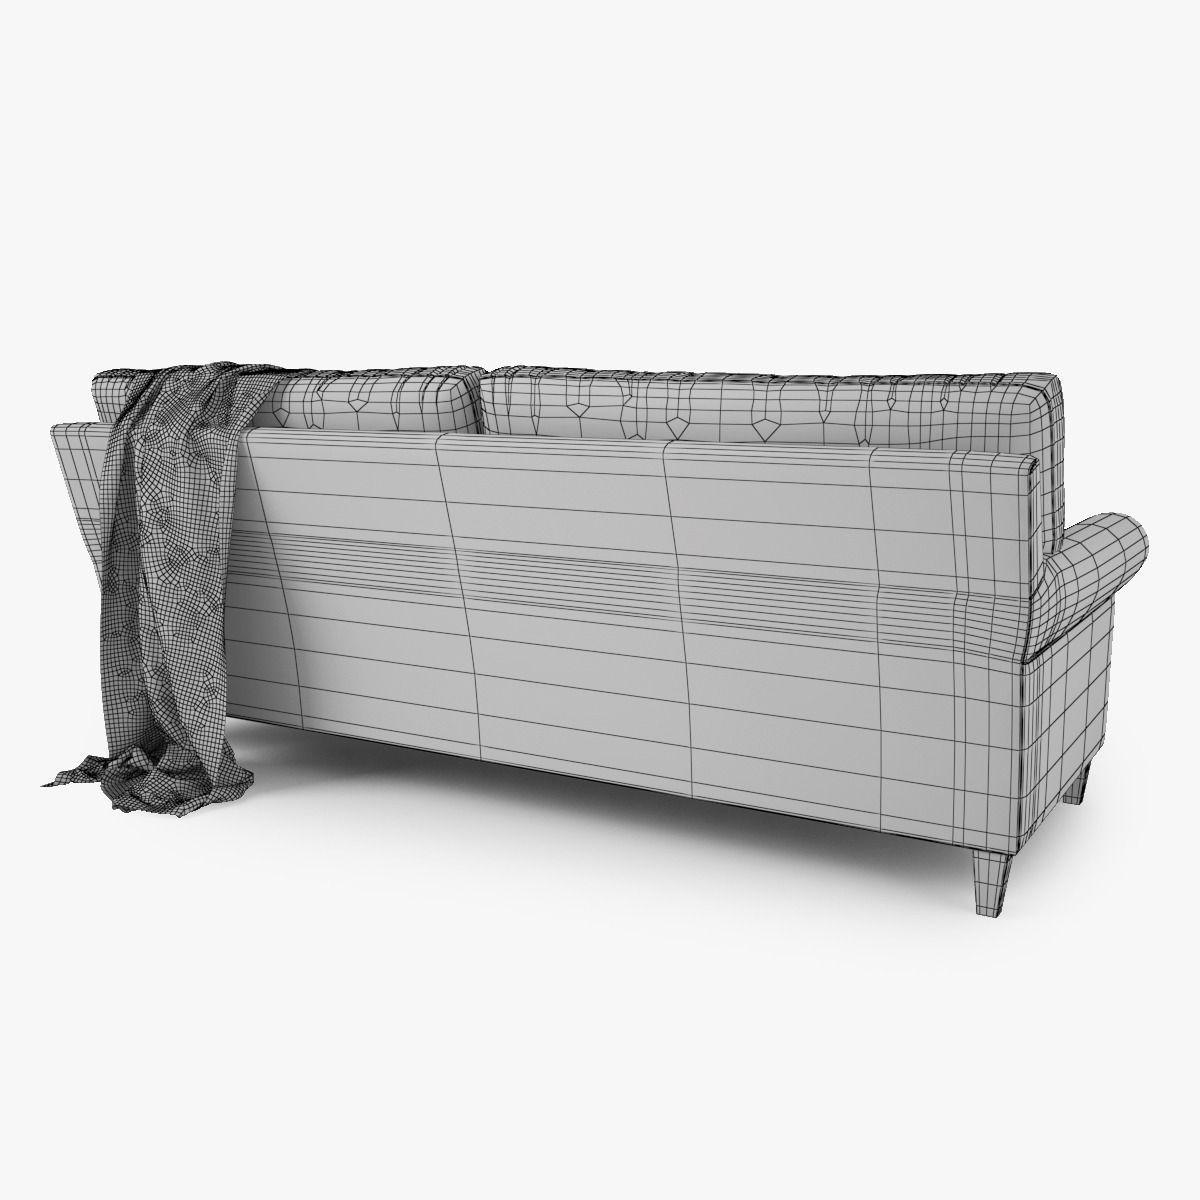 Crate And Barrel Montclair 2 Seat Sofa 3d Model Rigged Max